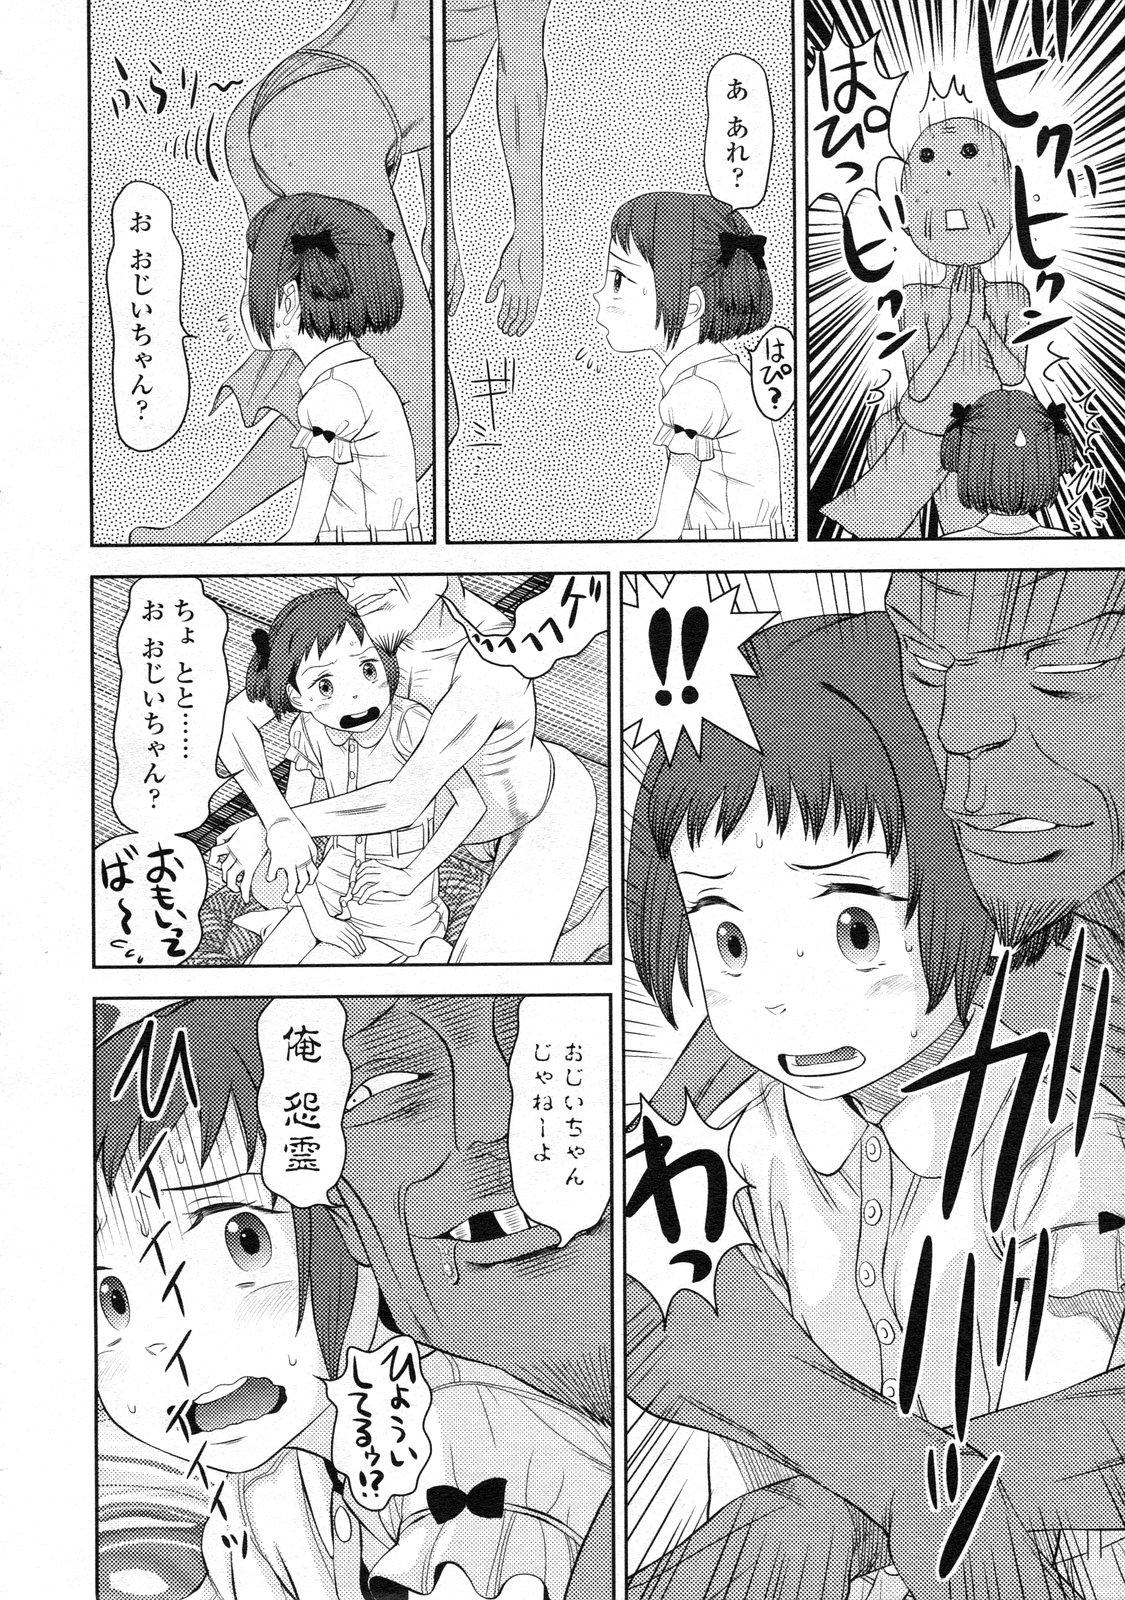 COMIC LO 2009-09 Vol. 66 184